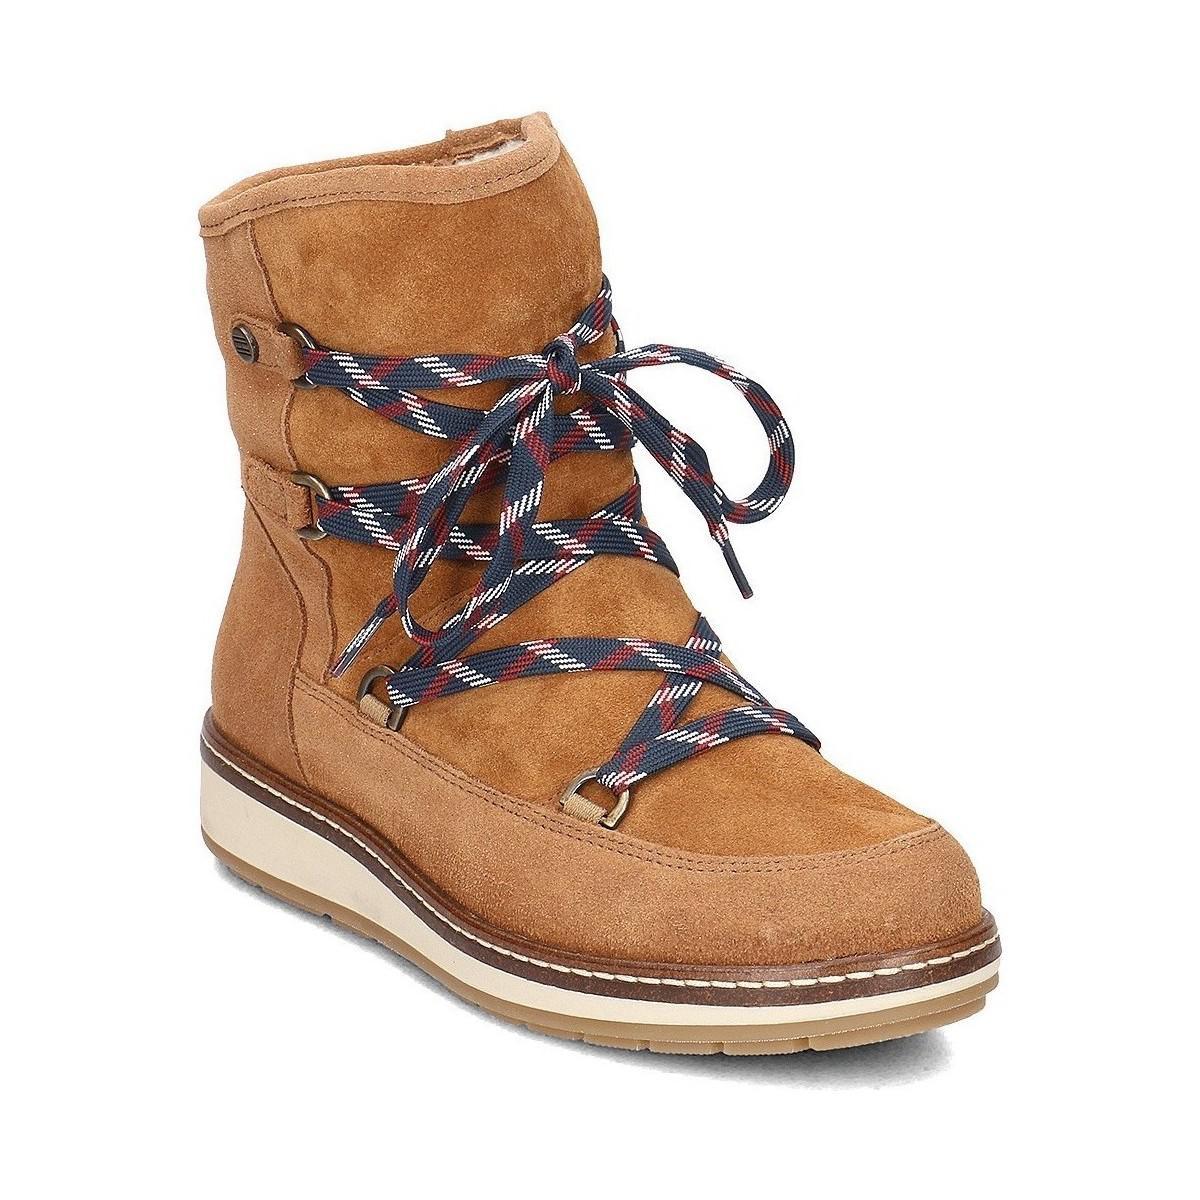 19d73d8c526b tommy-hilfiger-brown-Wooli-14c-Womens-Snow-Boots-In-Brown.jpeg